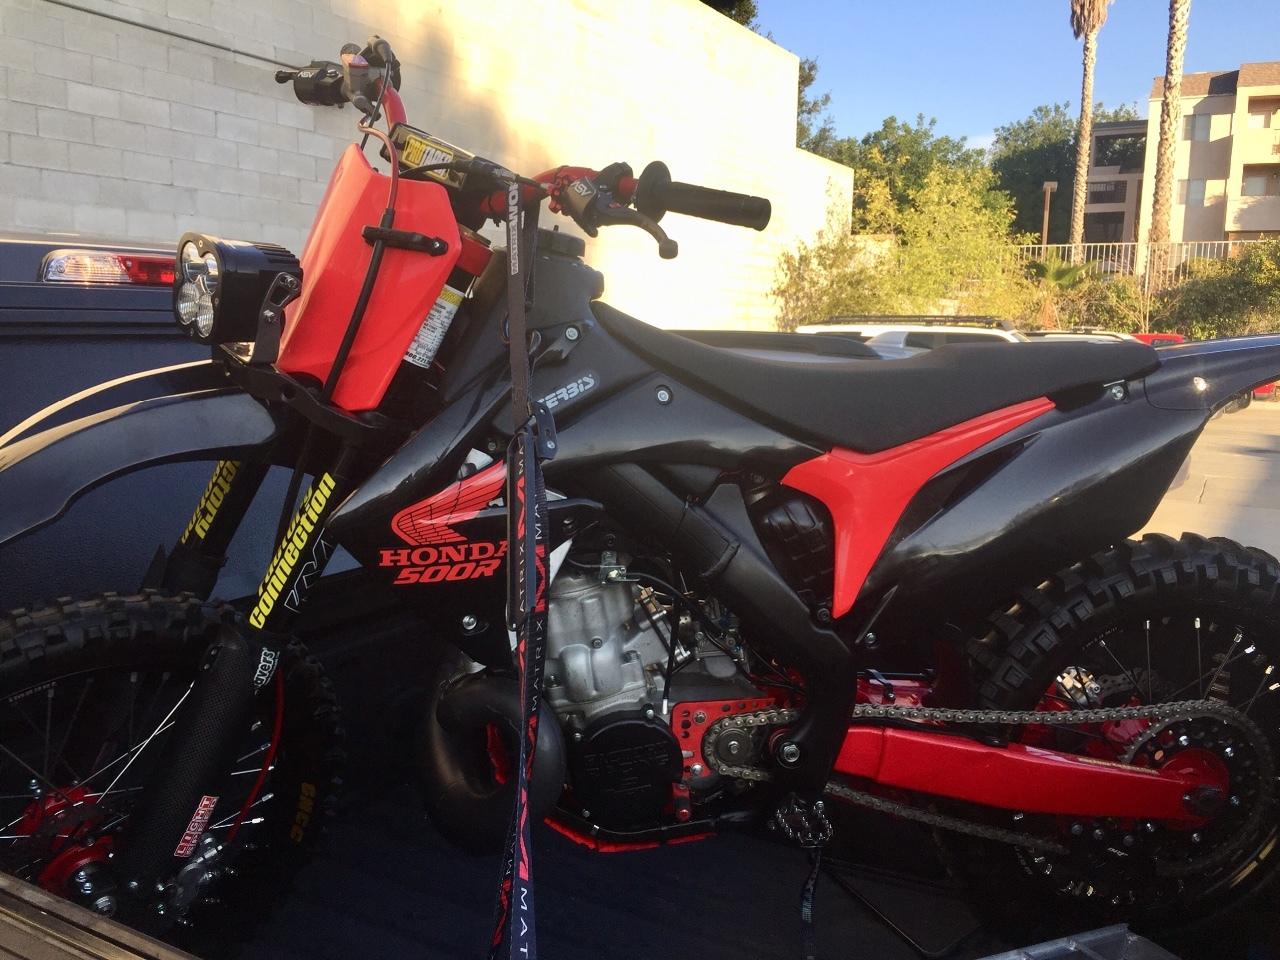 5816 Honda Dirt Bike Motorcycles For Sale Cycle Trader 2003 Mini Bikes